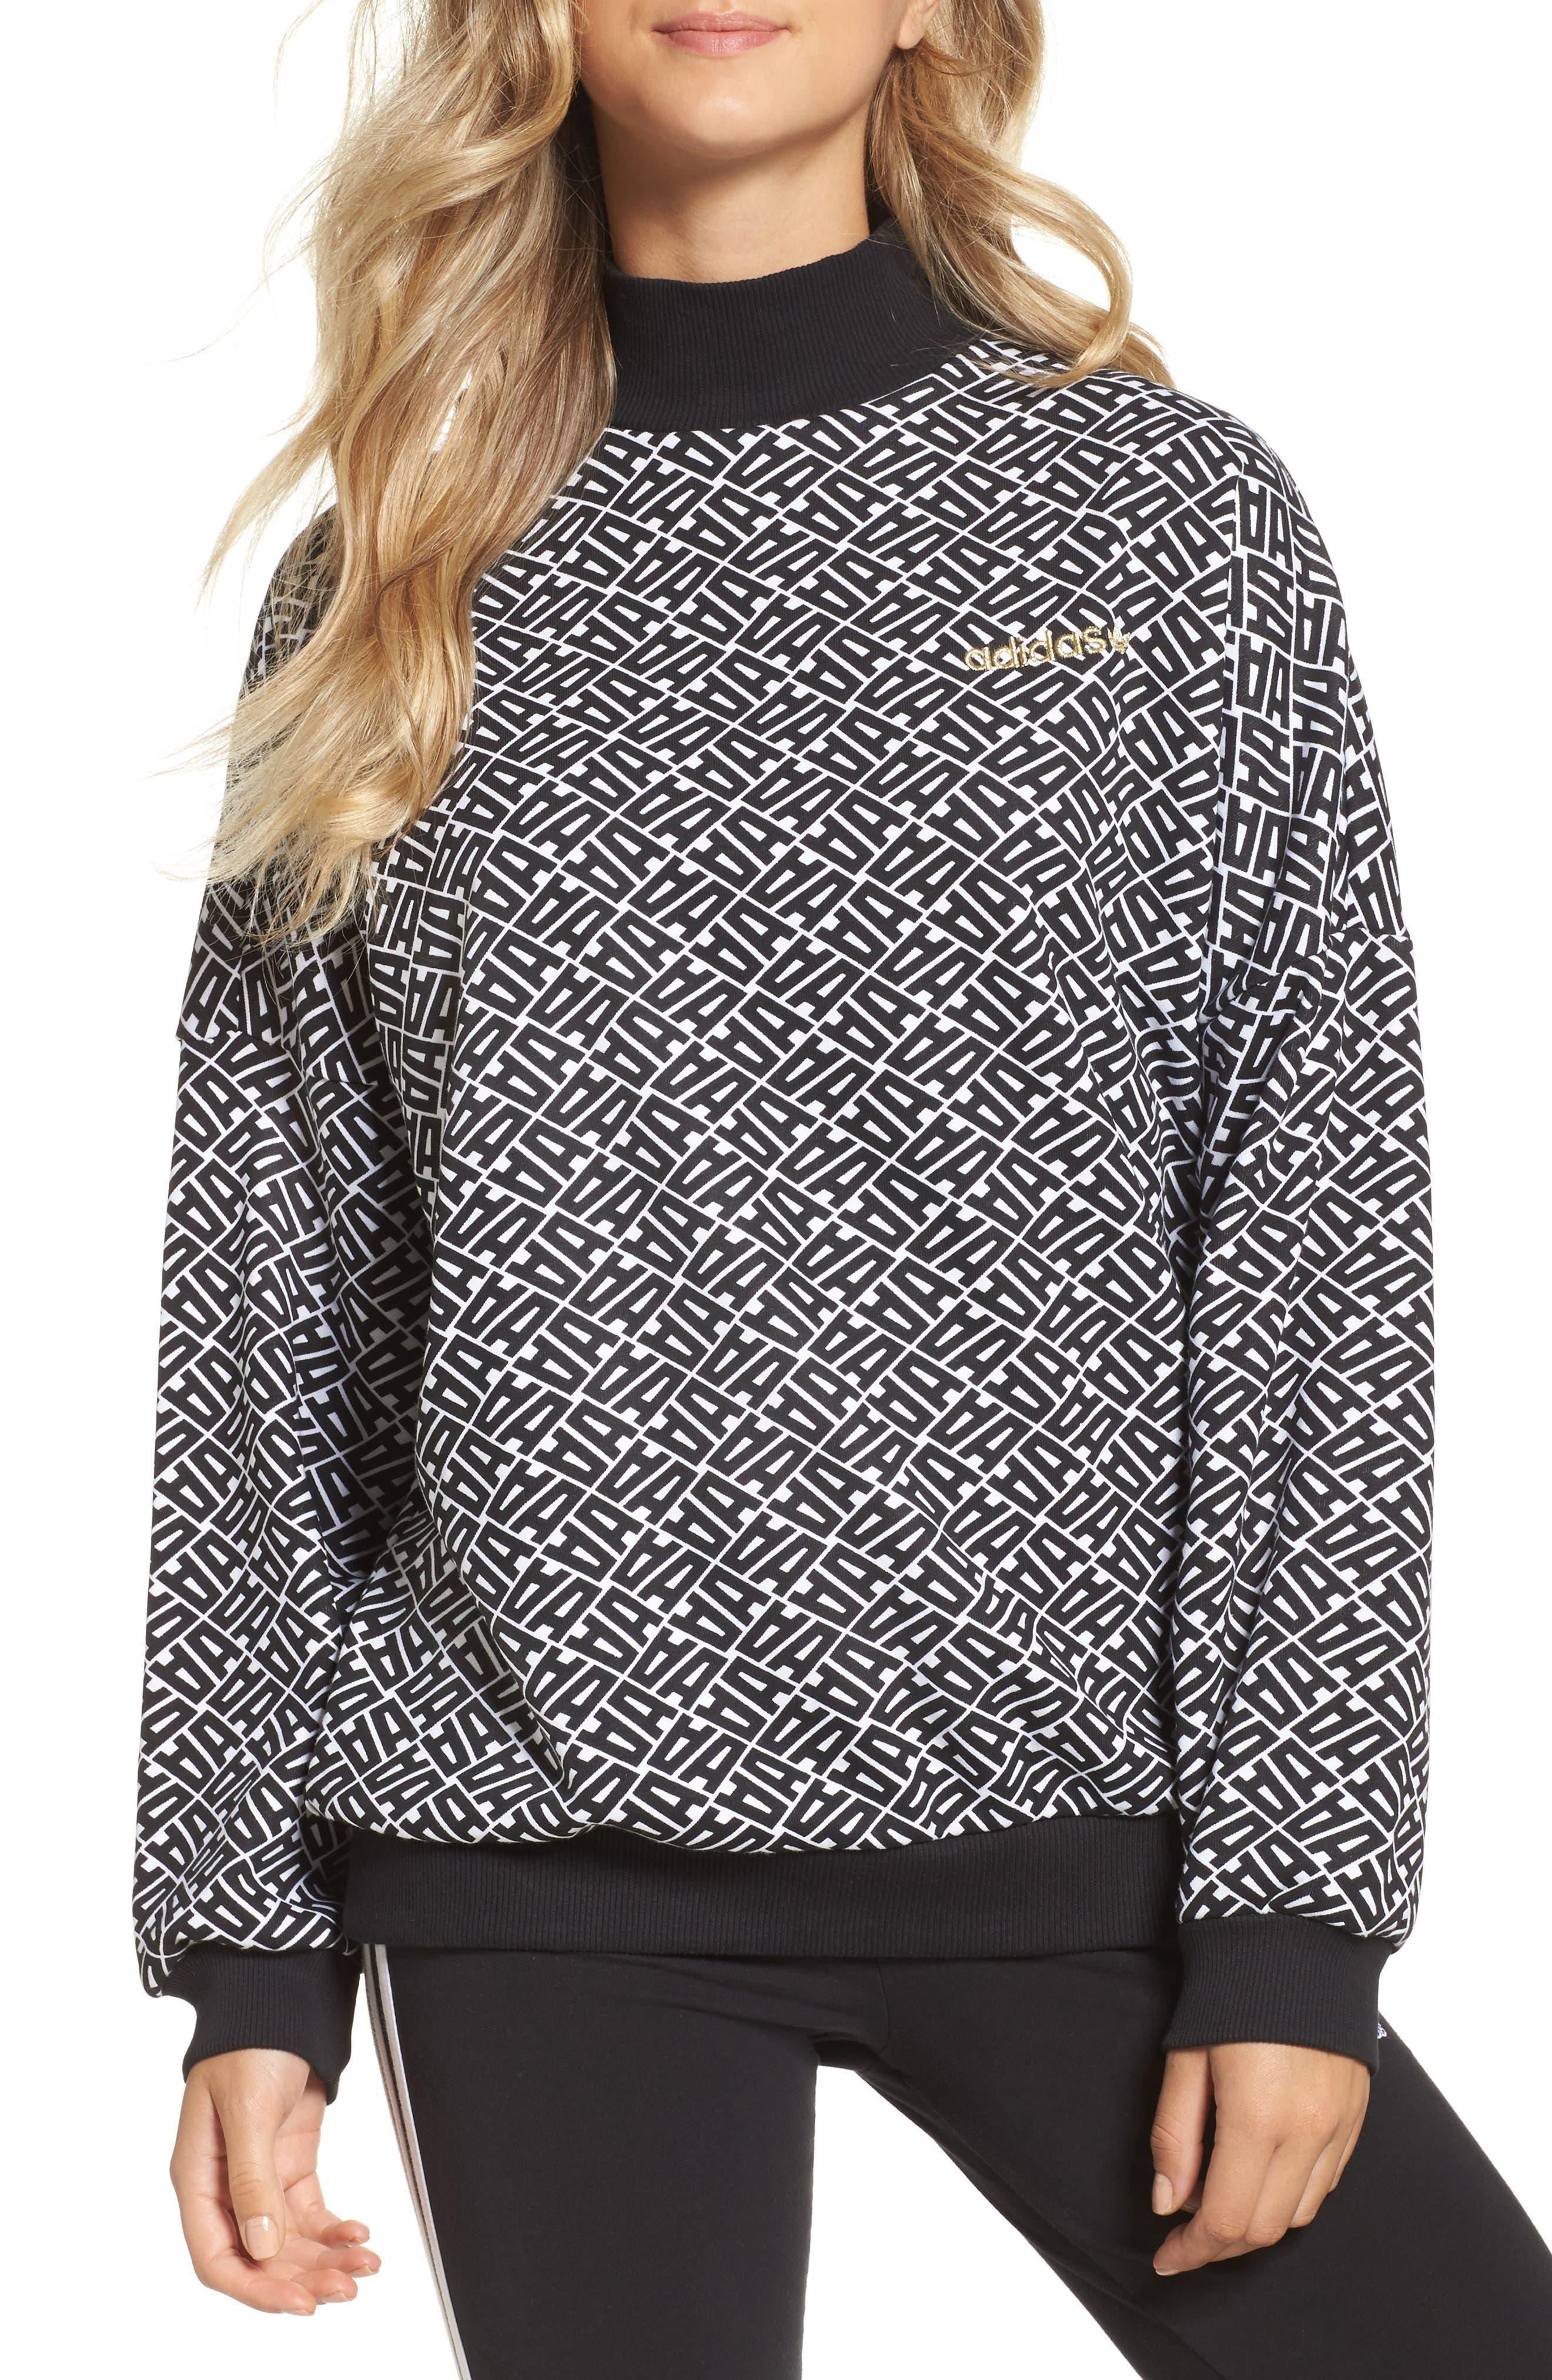 AOP Print Sweatshirt,                             Main thumbnail 1, color,                             001